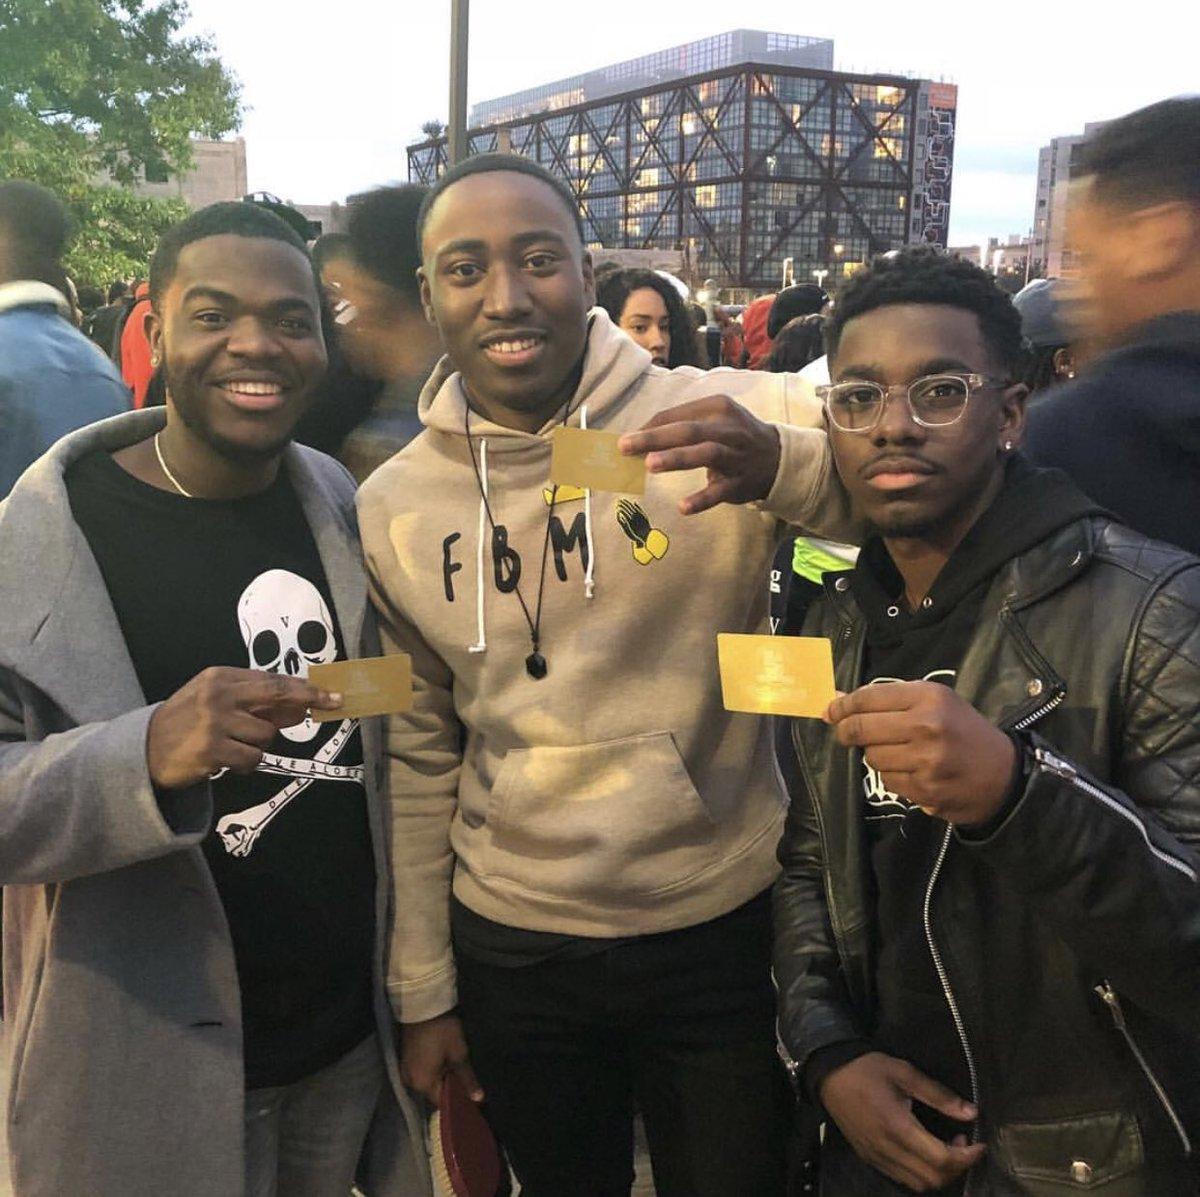 Faithful Black Men Association (@OfficialFBMA)